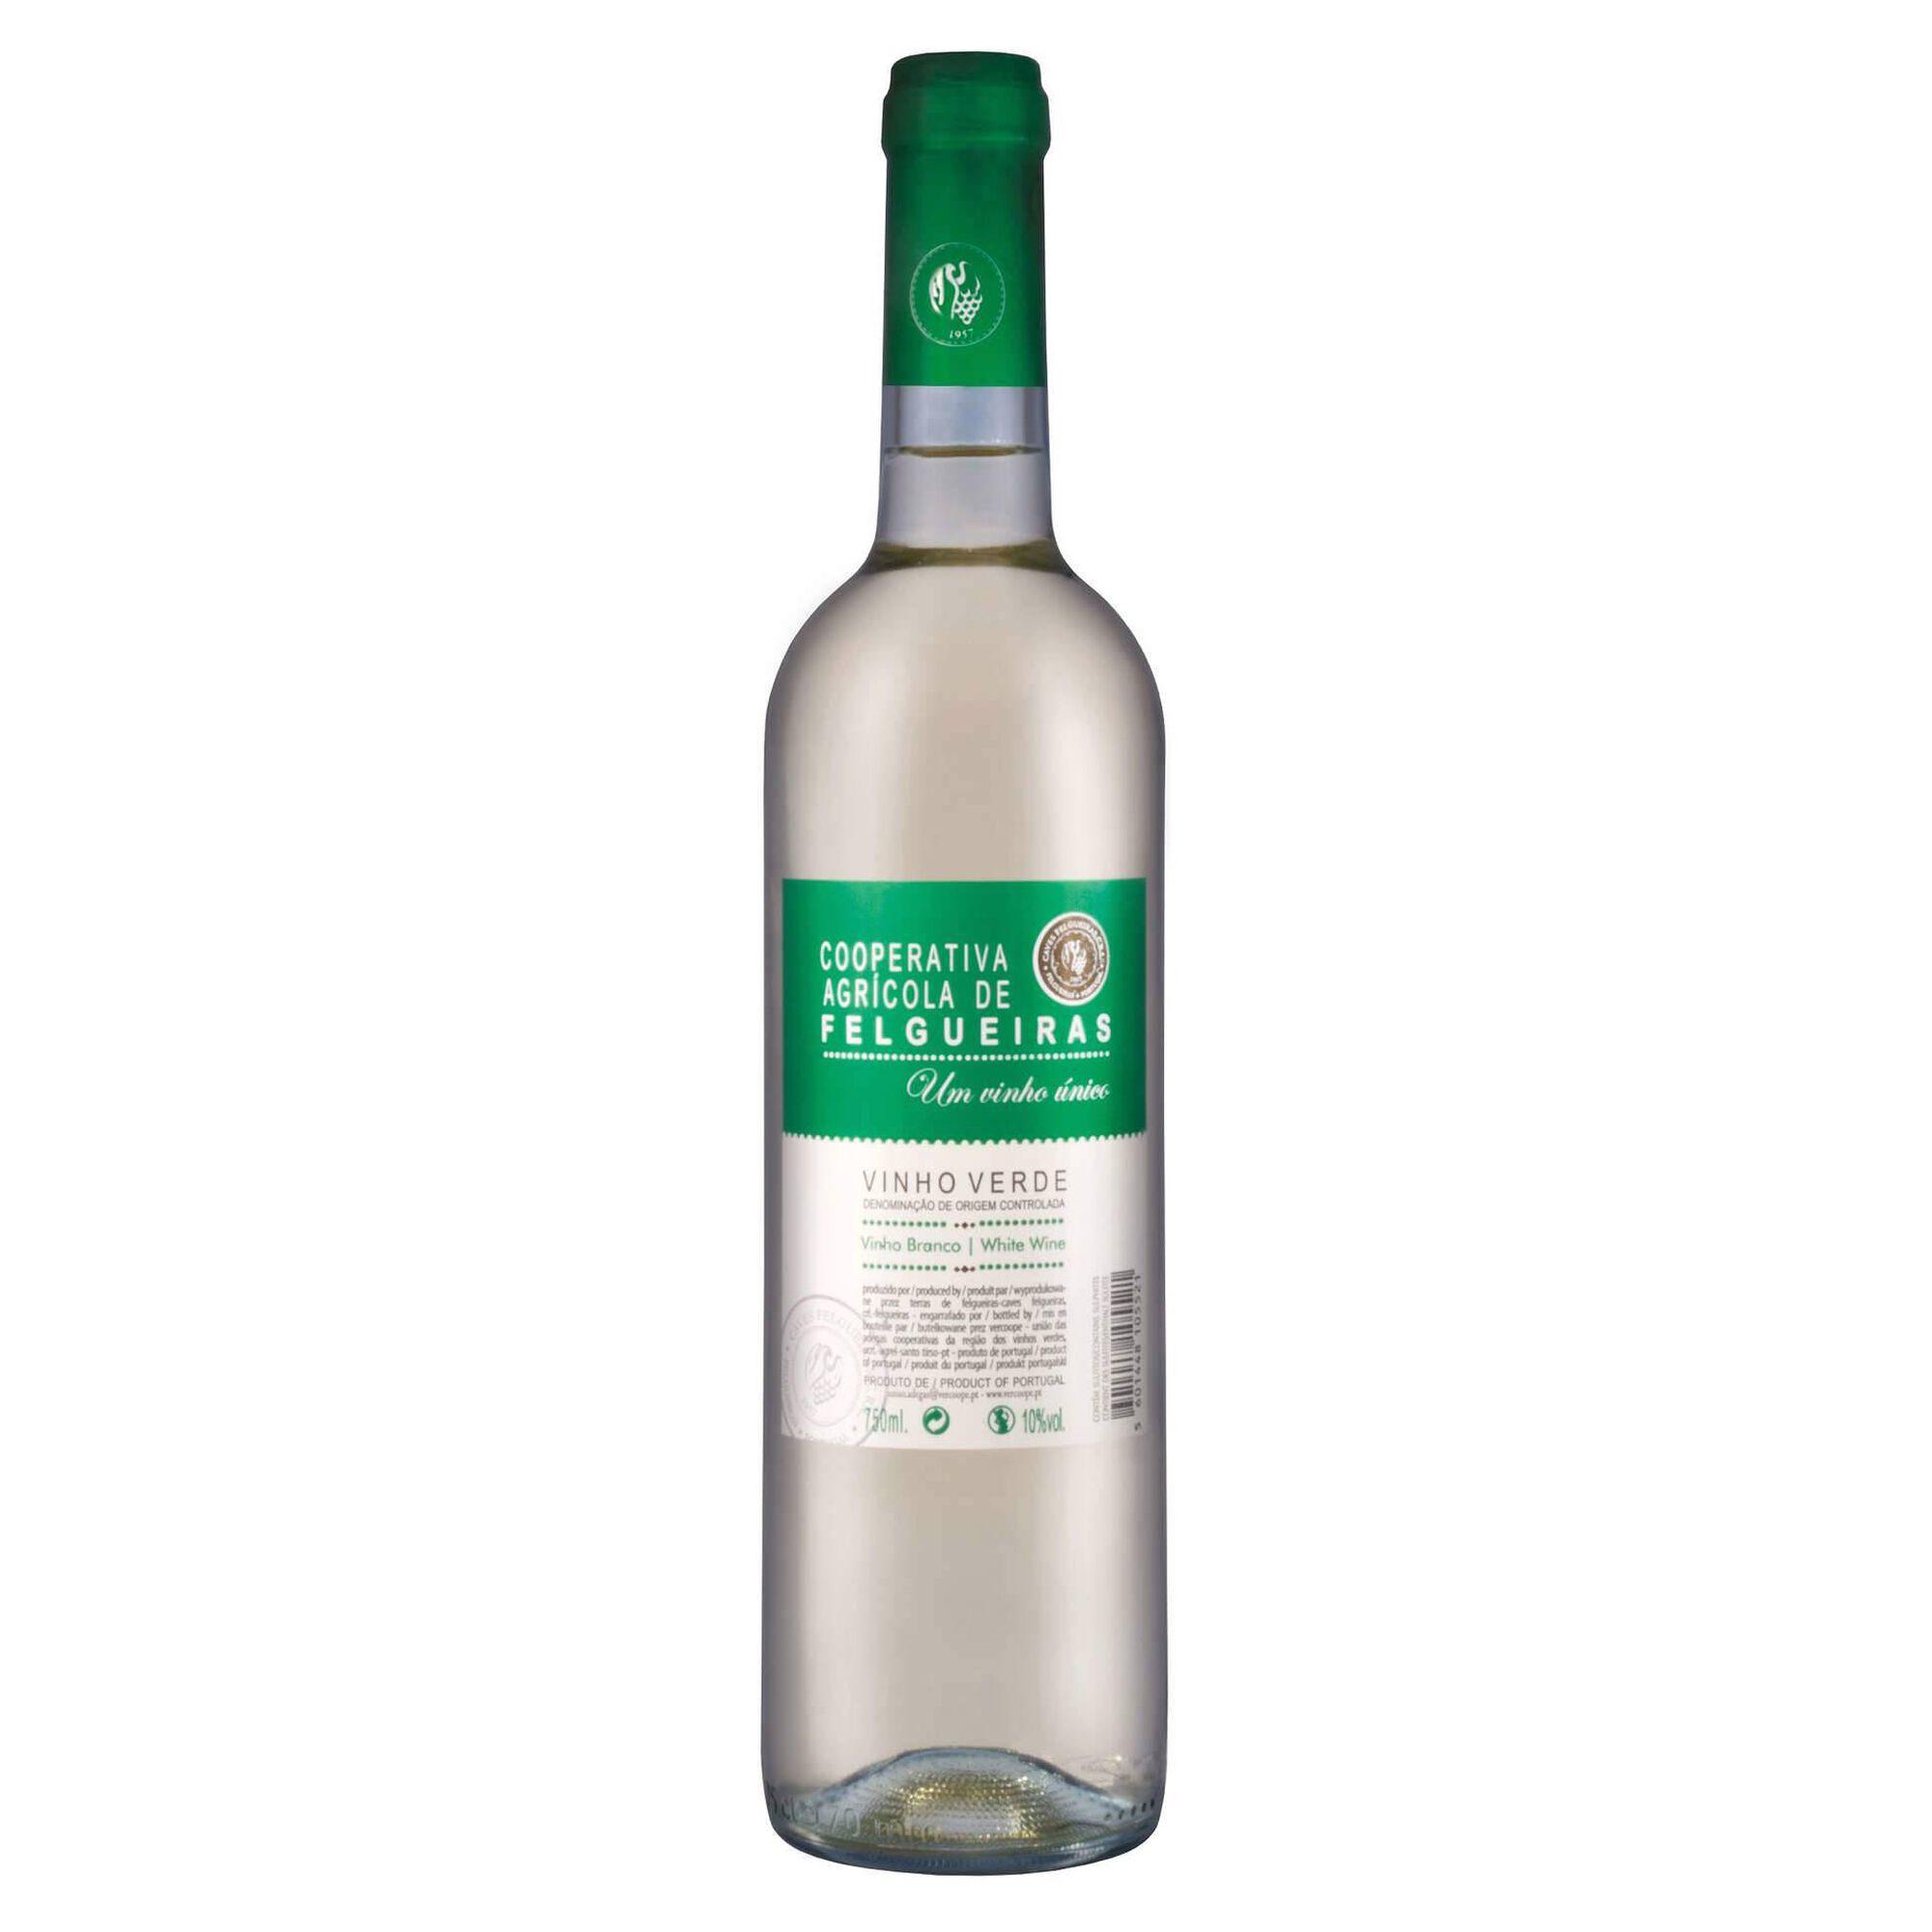 Cooperativa Agrícola Felgueiras DOC Vinho Verde Branco